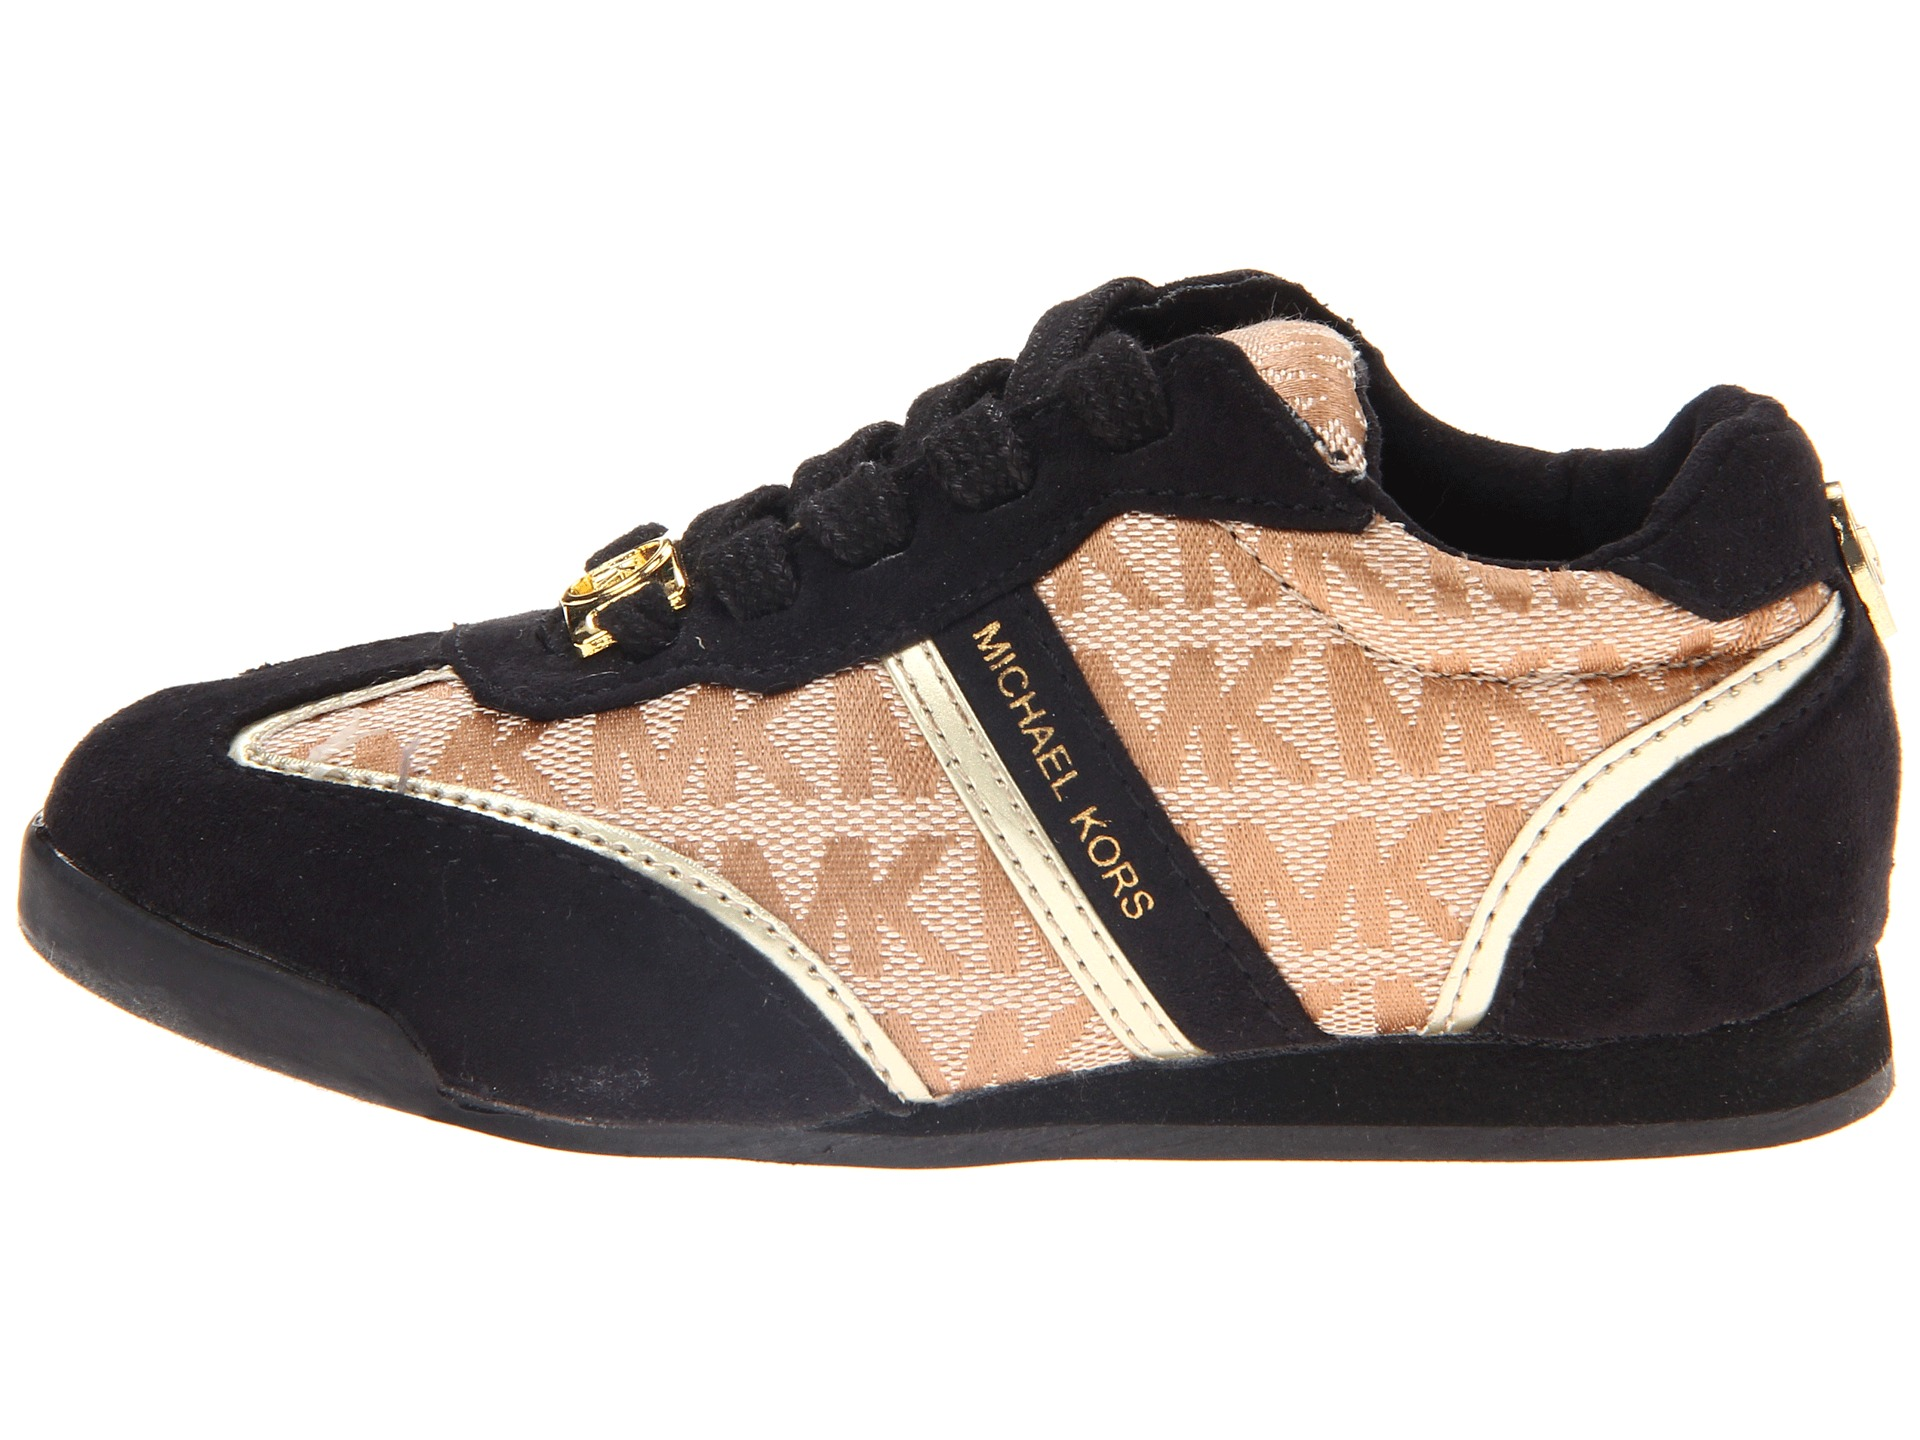 Michael Kors Kids Shoes Michael michael kors kids